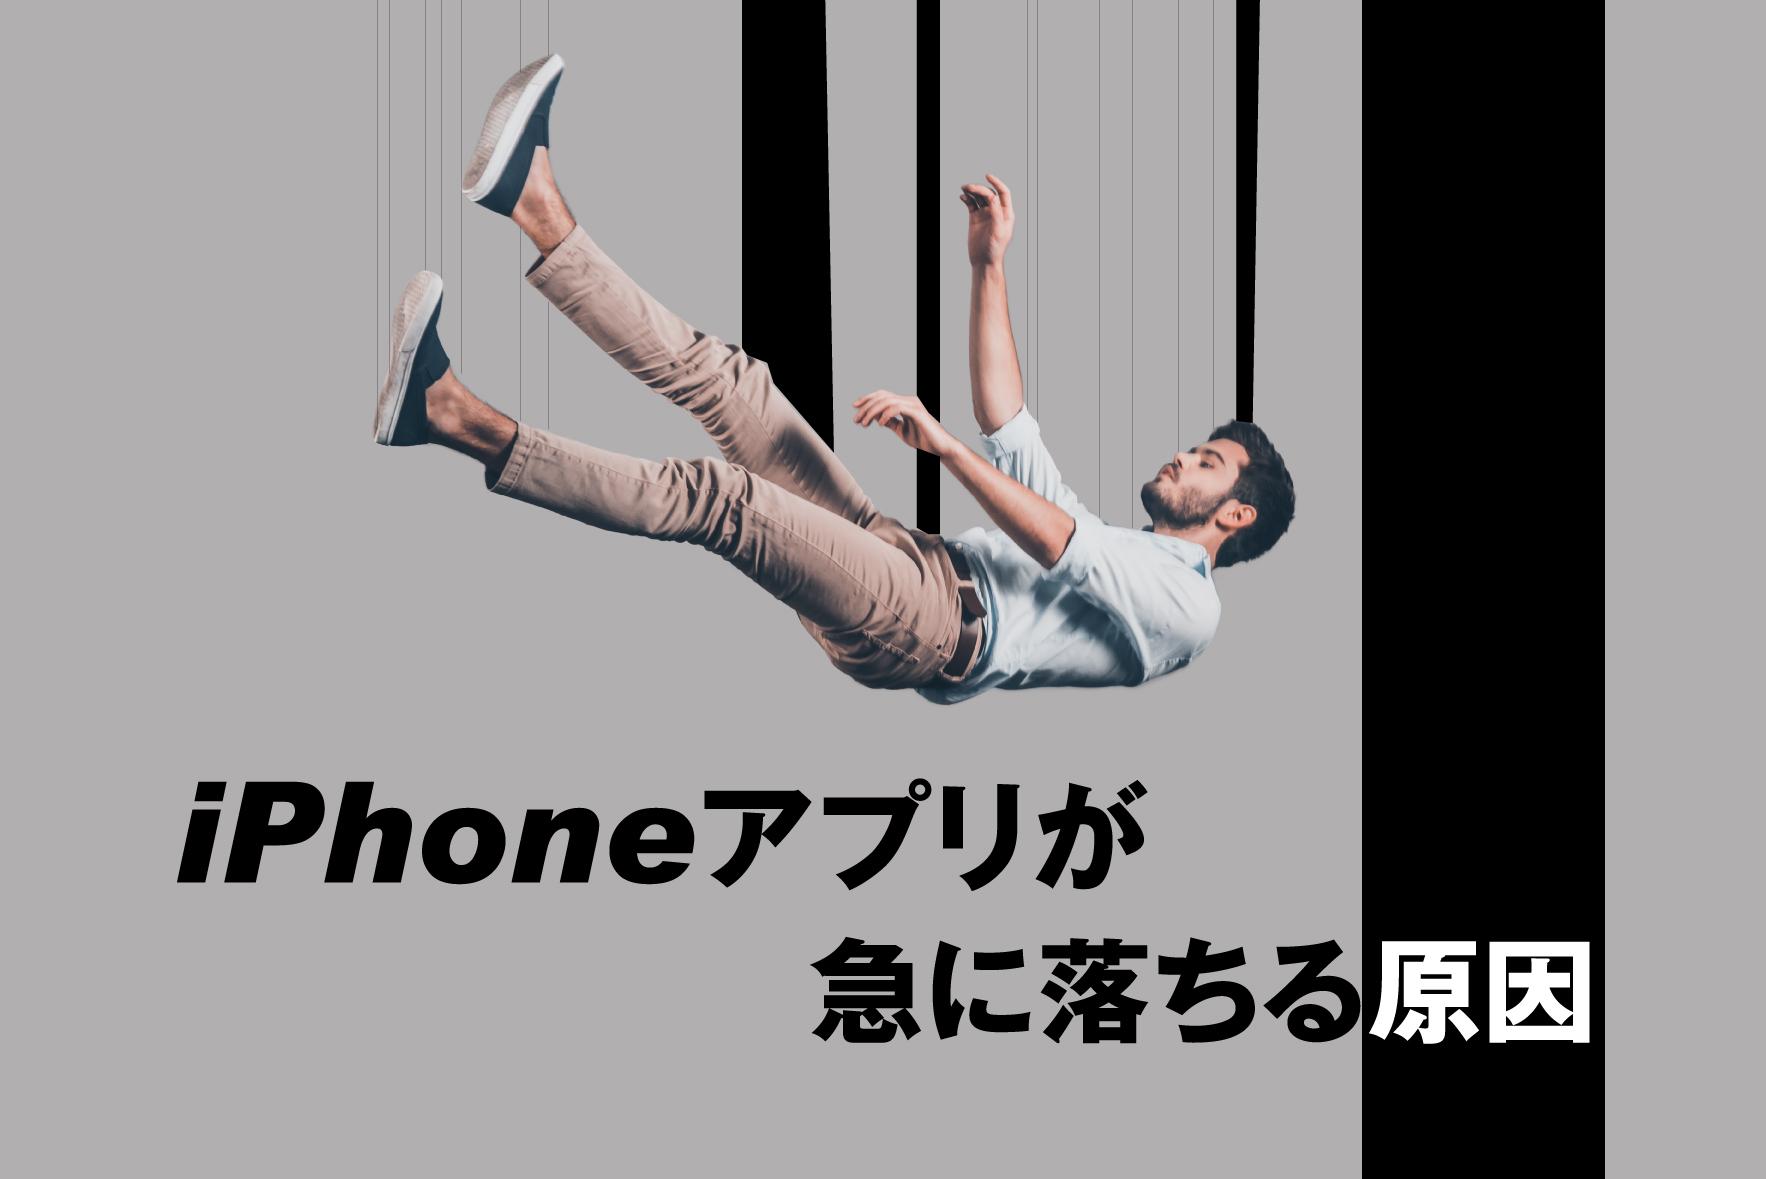 iPhoneアプリが突然落ちる3つの原因・対処法